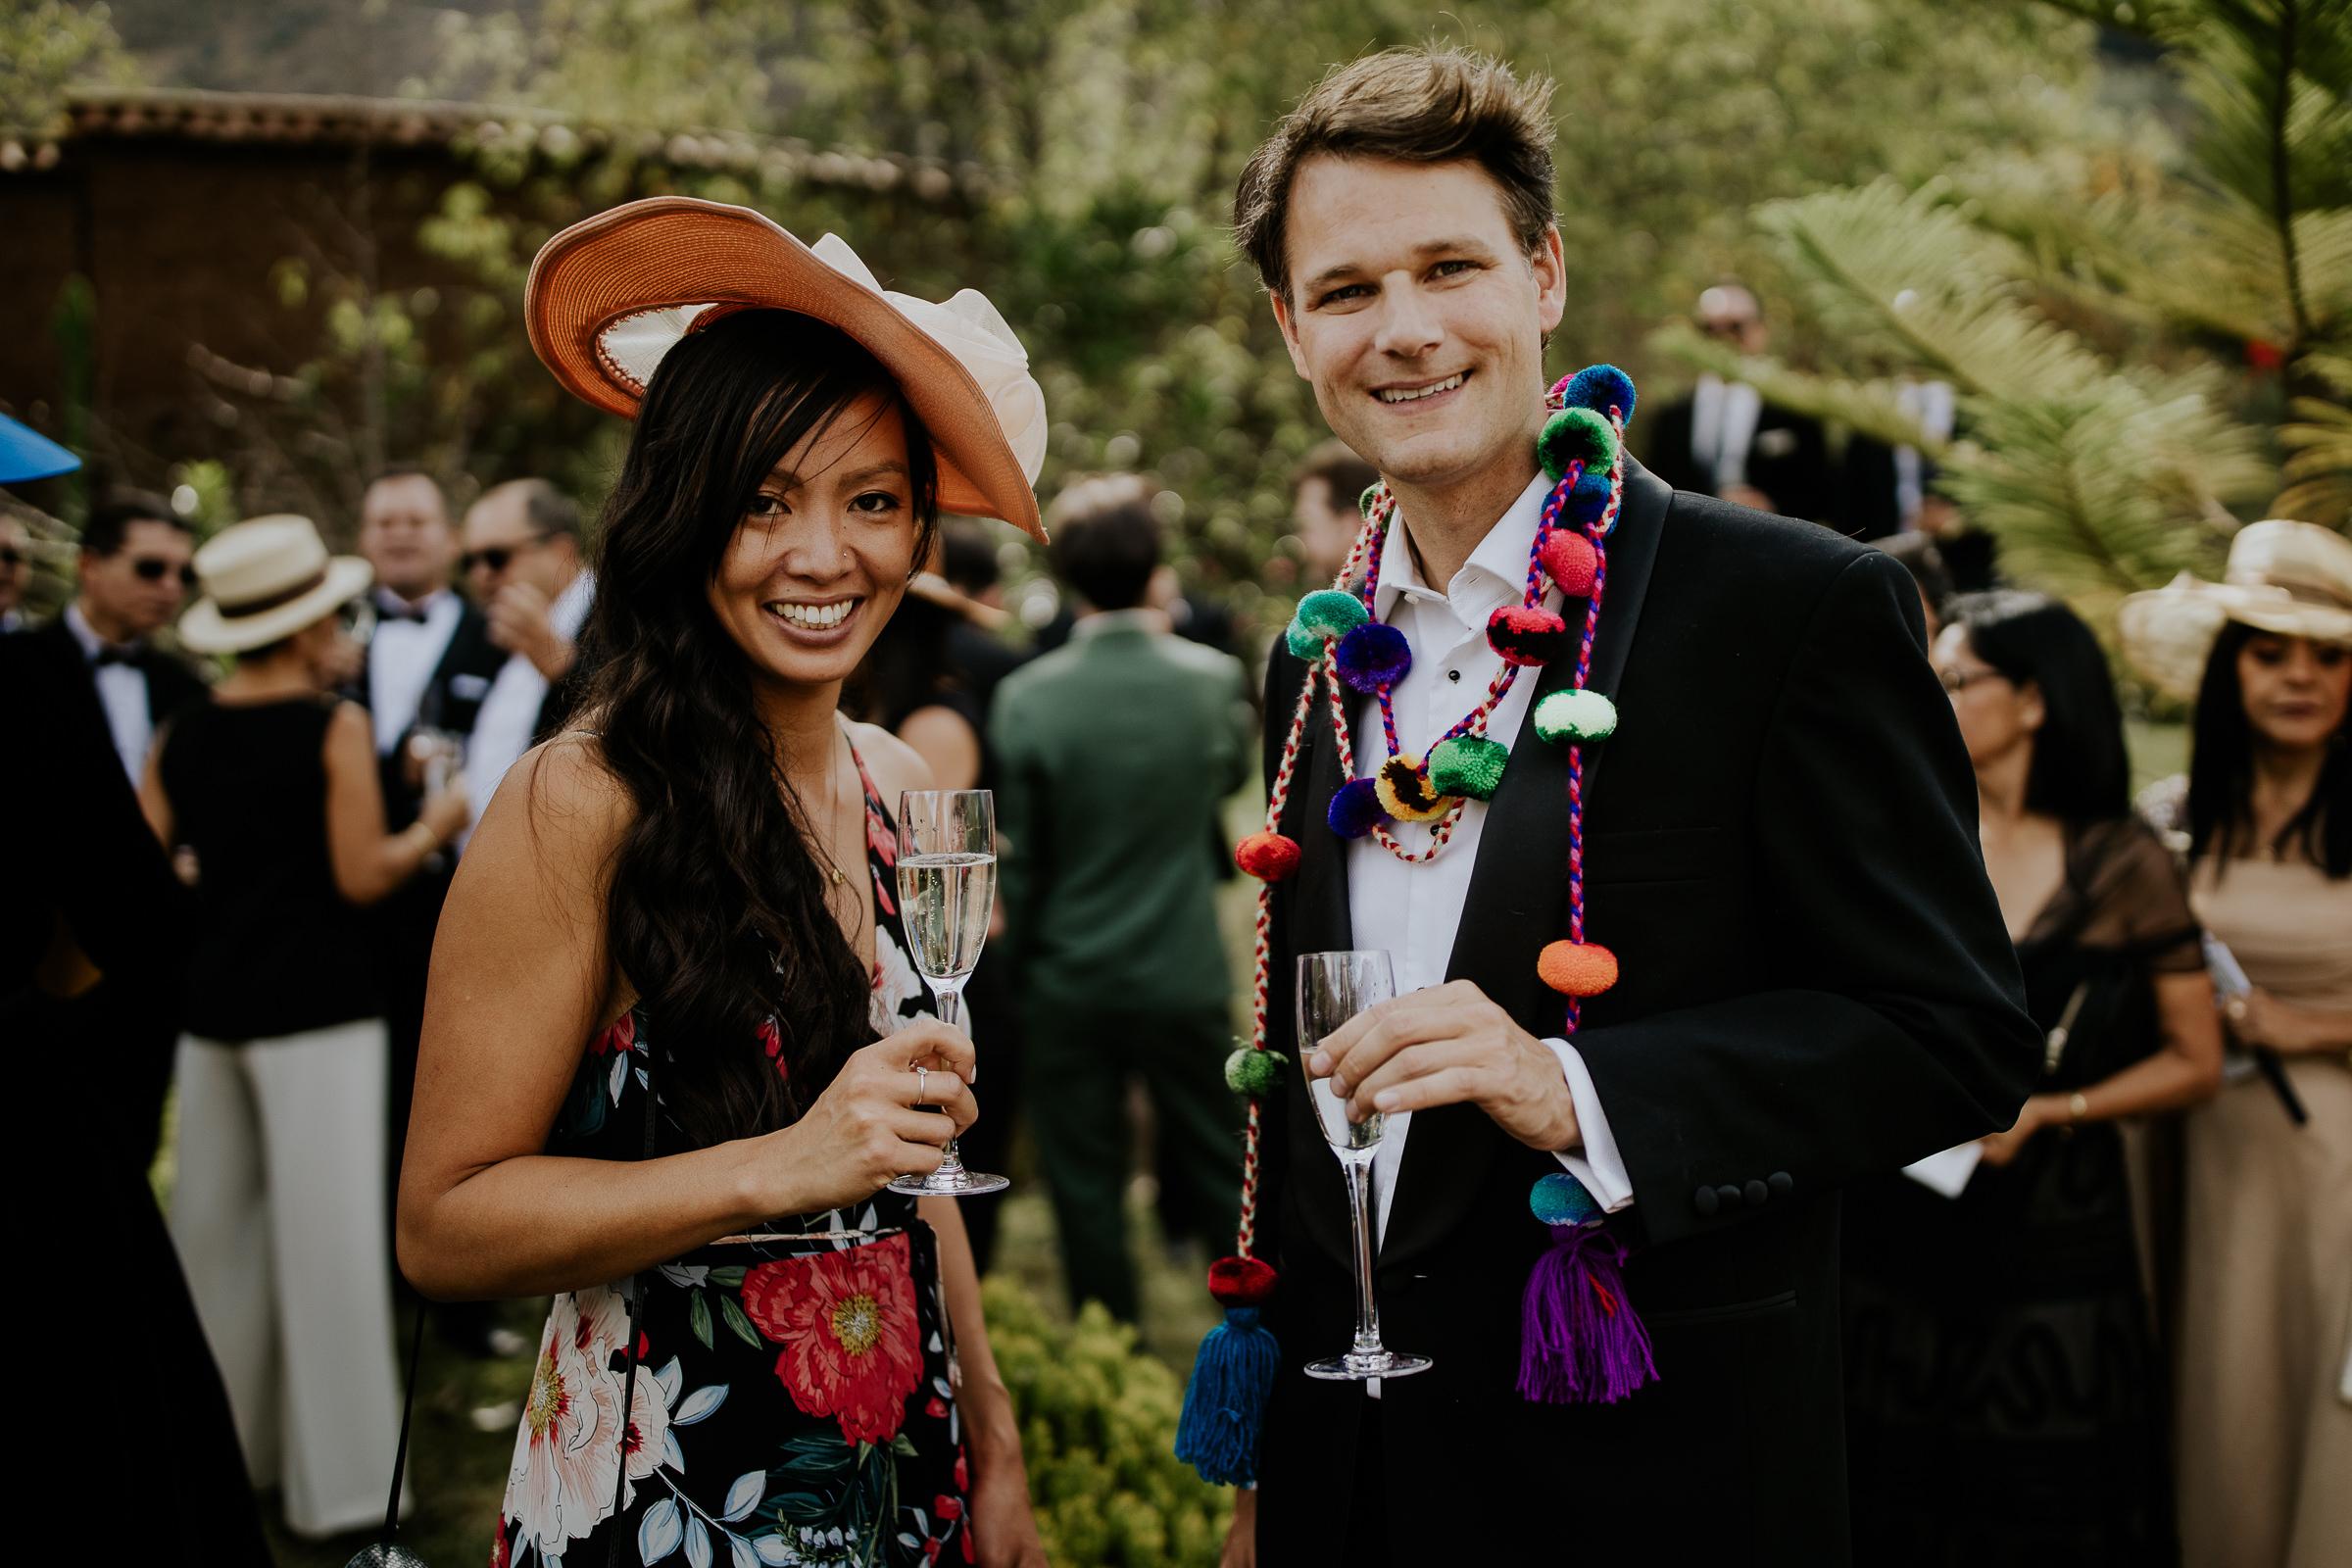 man and woman at a wedding cocktail look at the camera